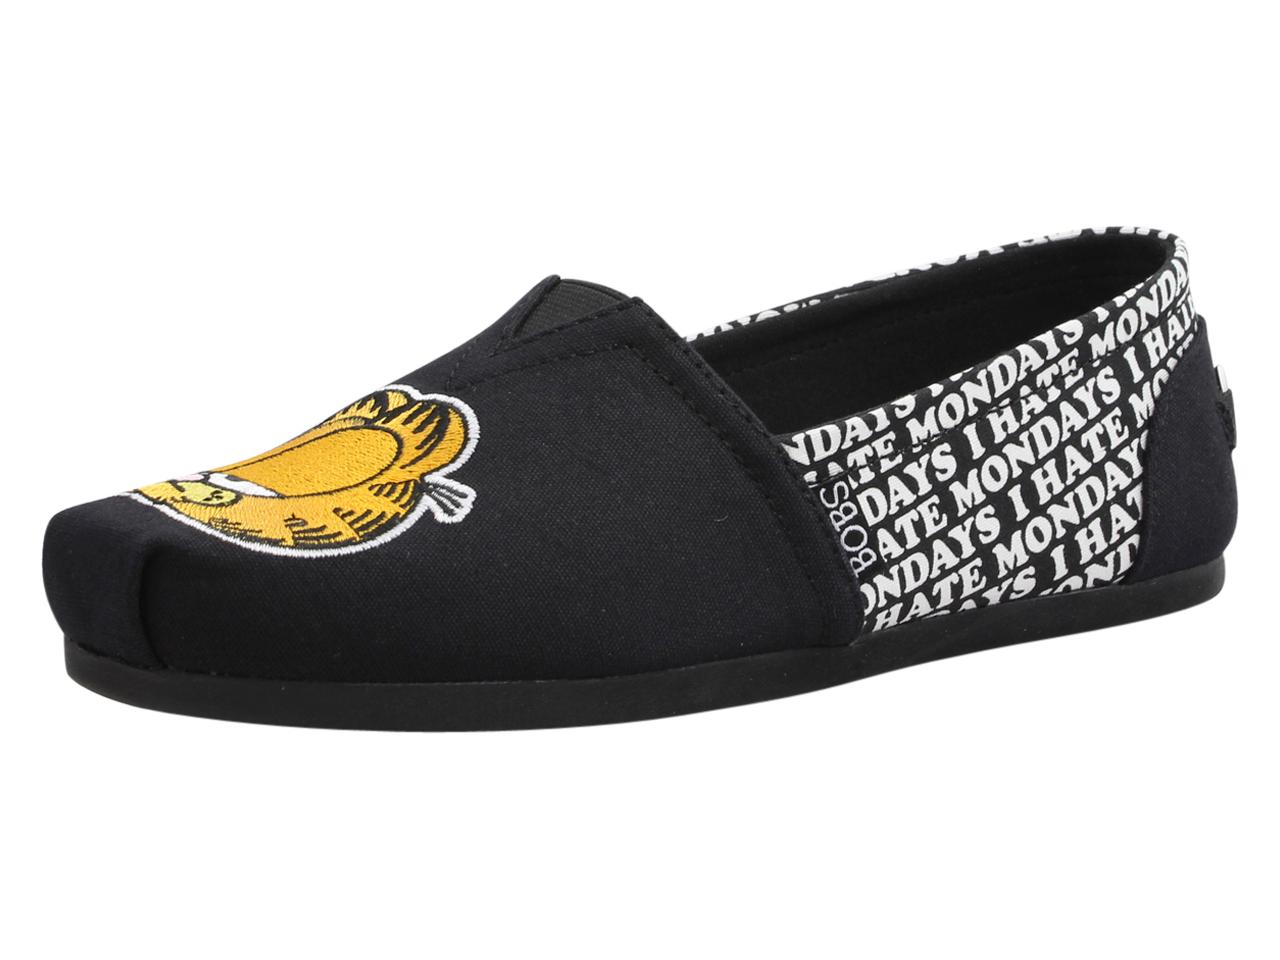 78d866f337e5 Skechers Women s Bobs Plush Monday Blues Memory Foam Alpargatas Flats Shoes